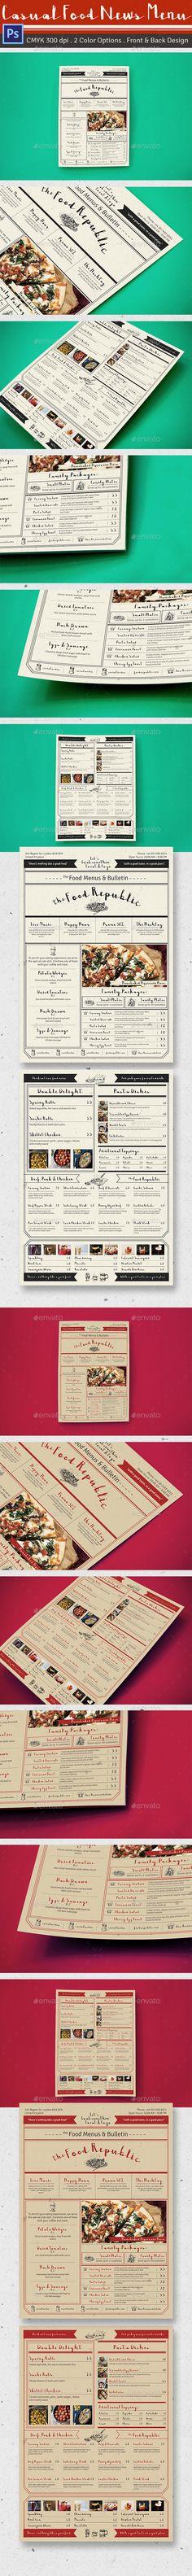 Casual Food News Menu Template PSD #design Download: http://graphicriver.net/item/casual-food-news-menu/14373949?ref=ksioks